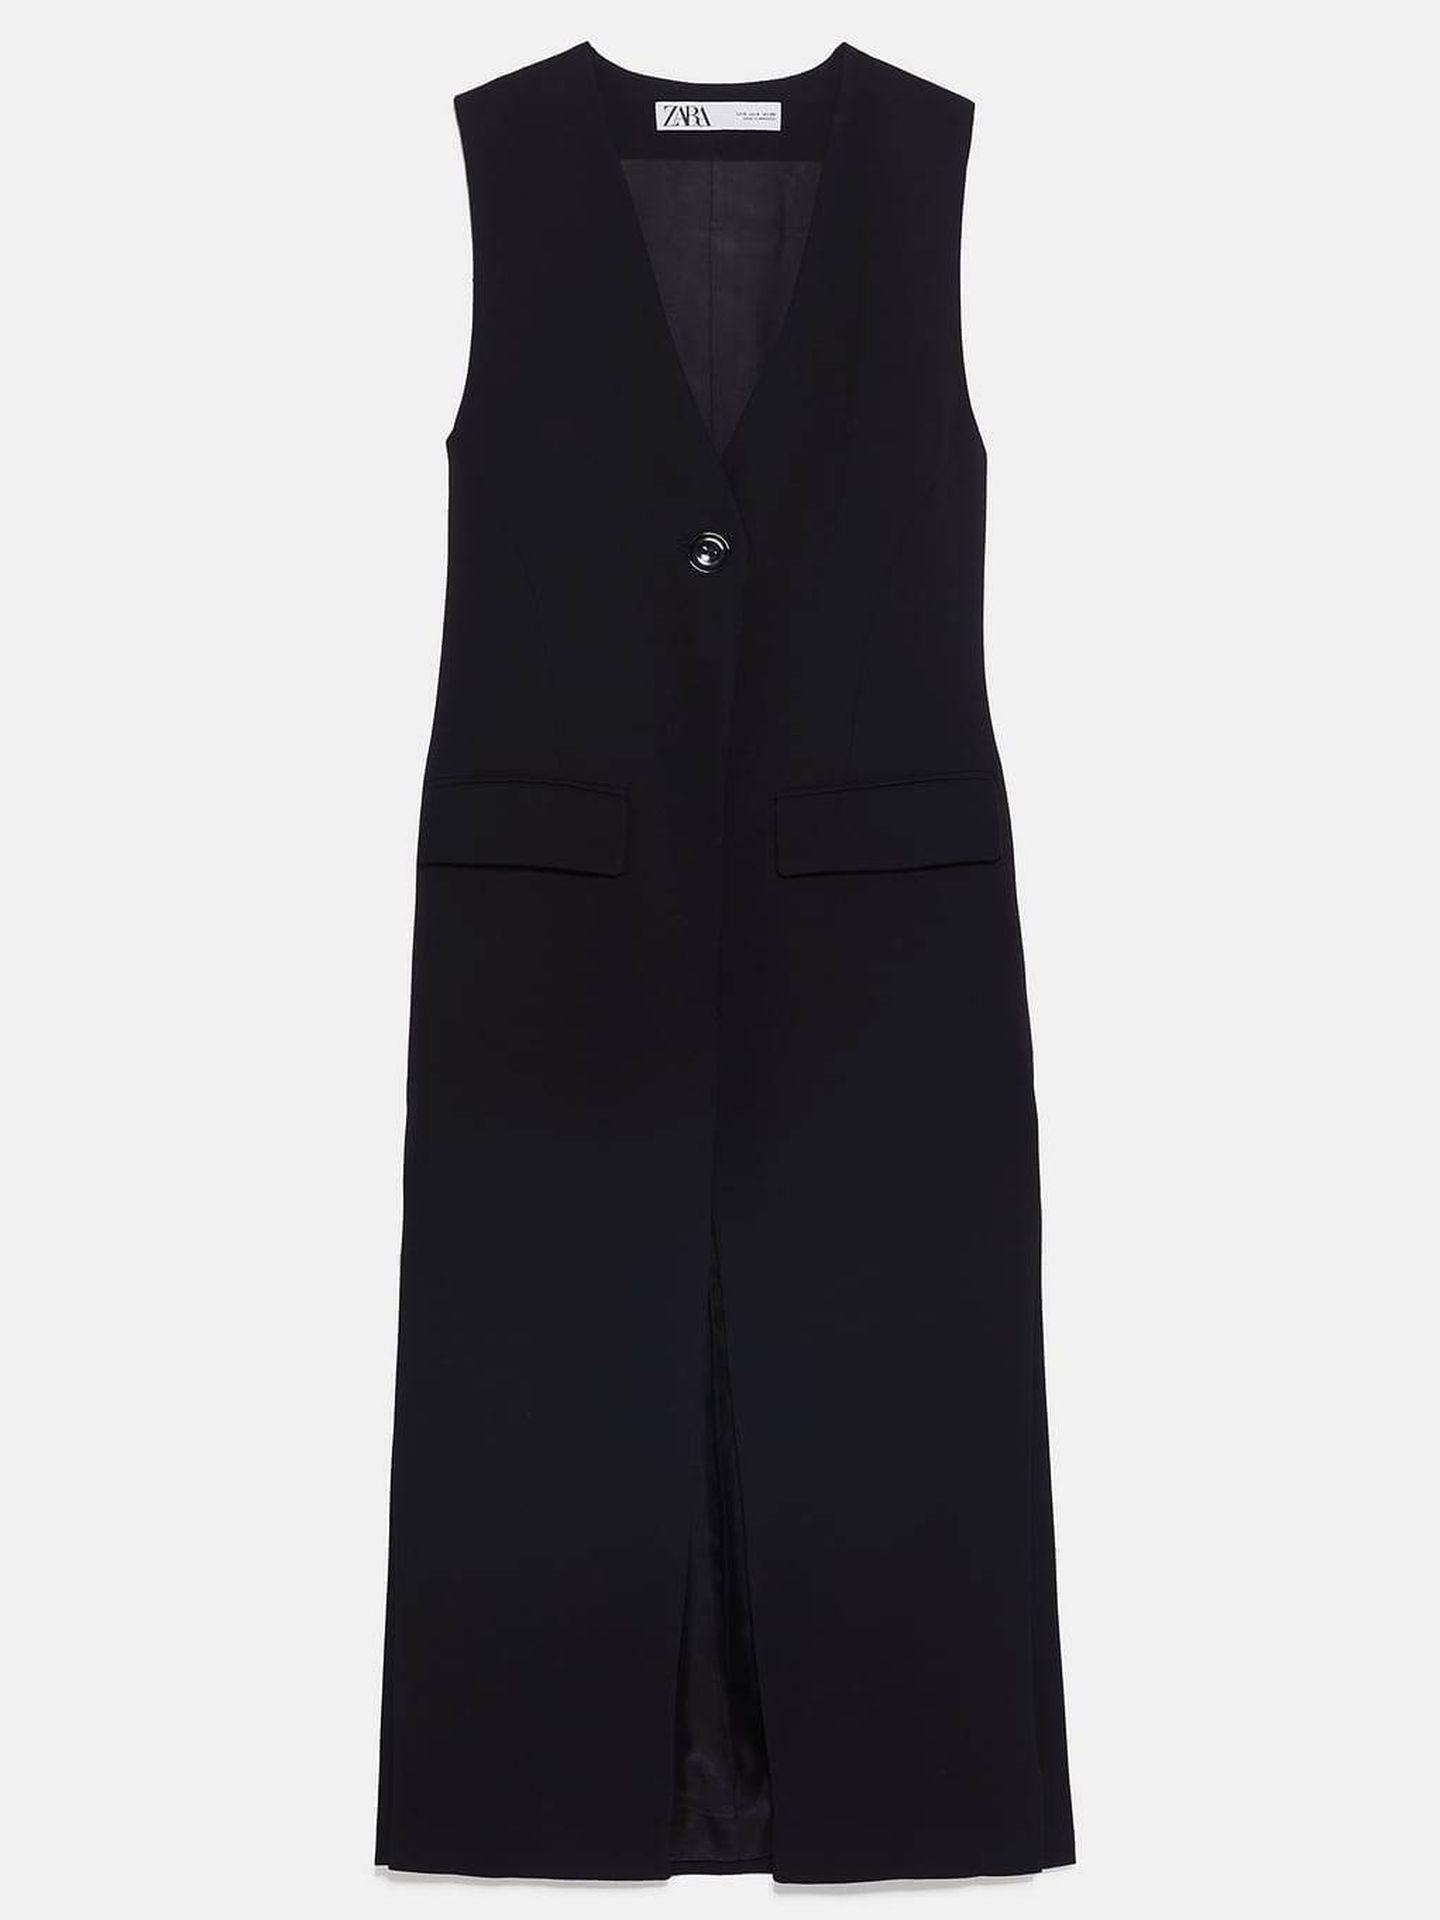 Chaleco de Zara. (49,95€)